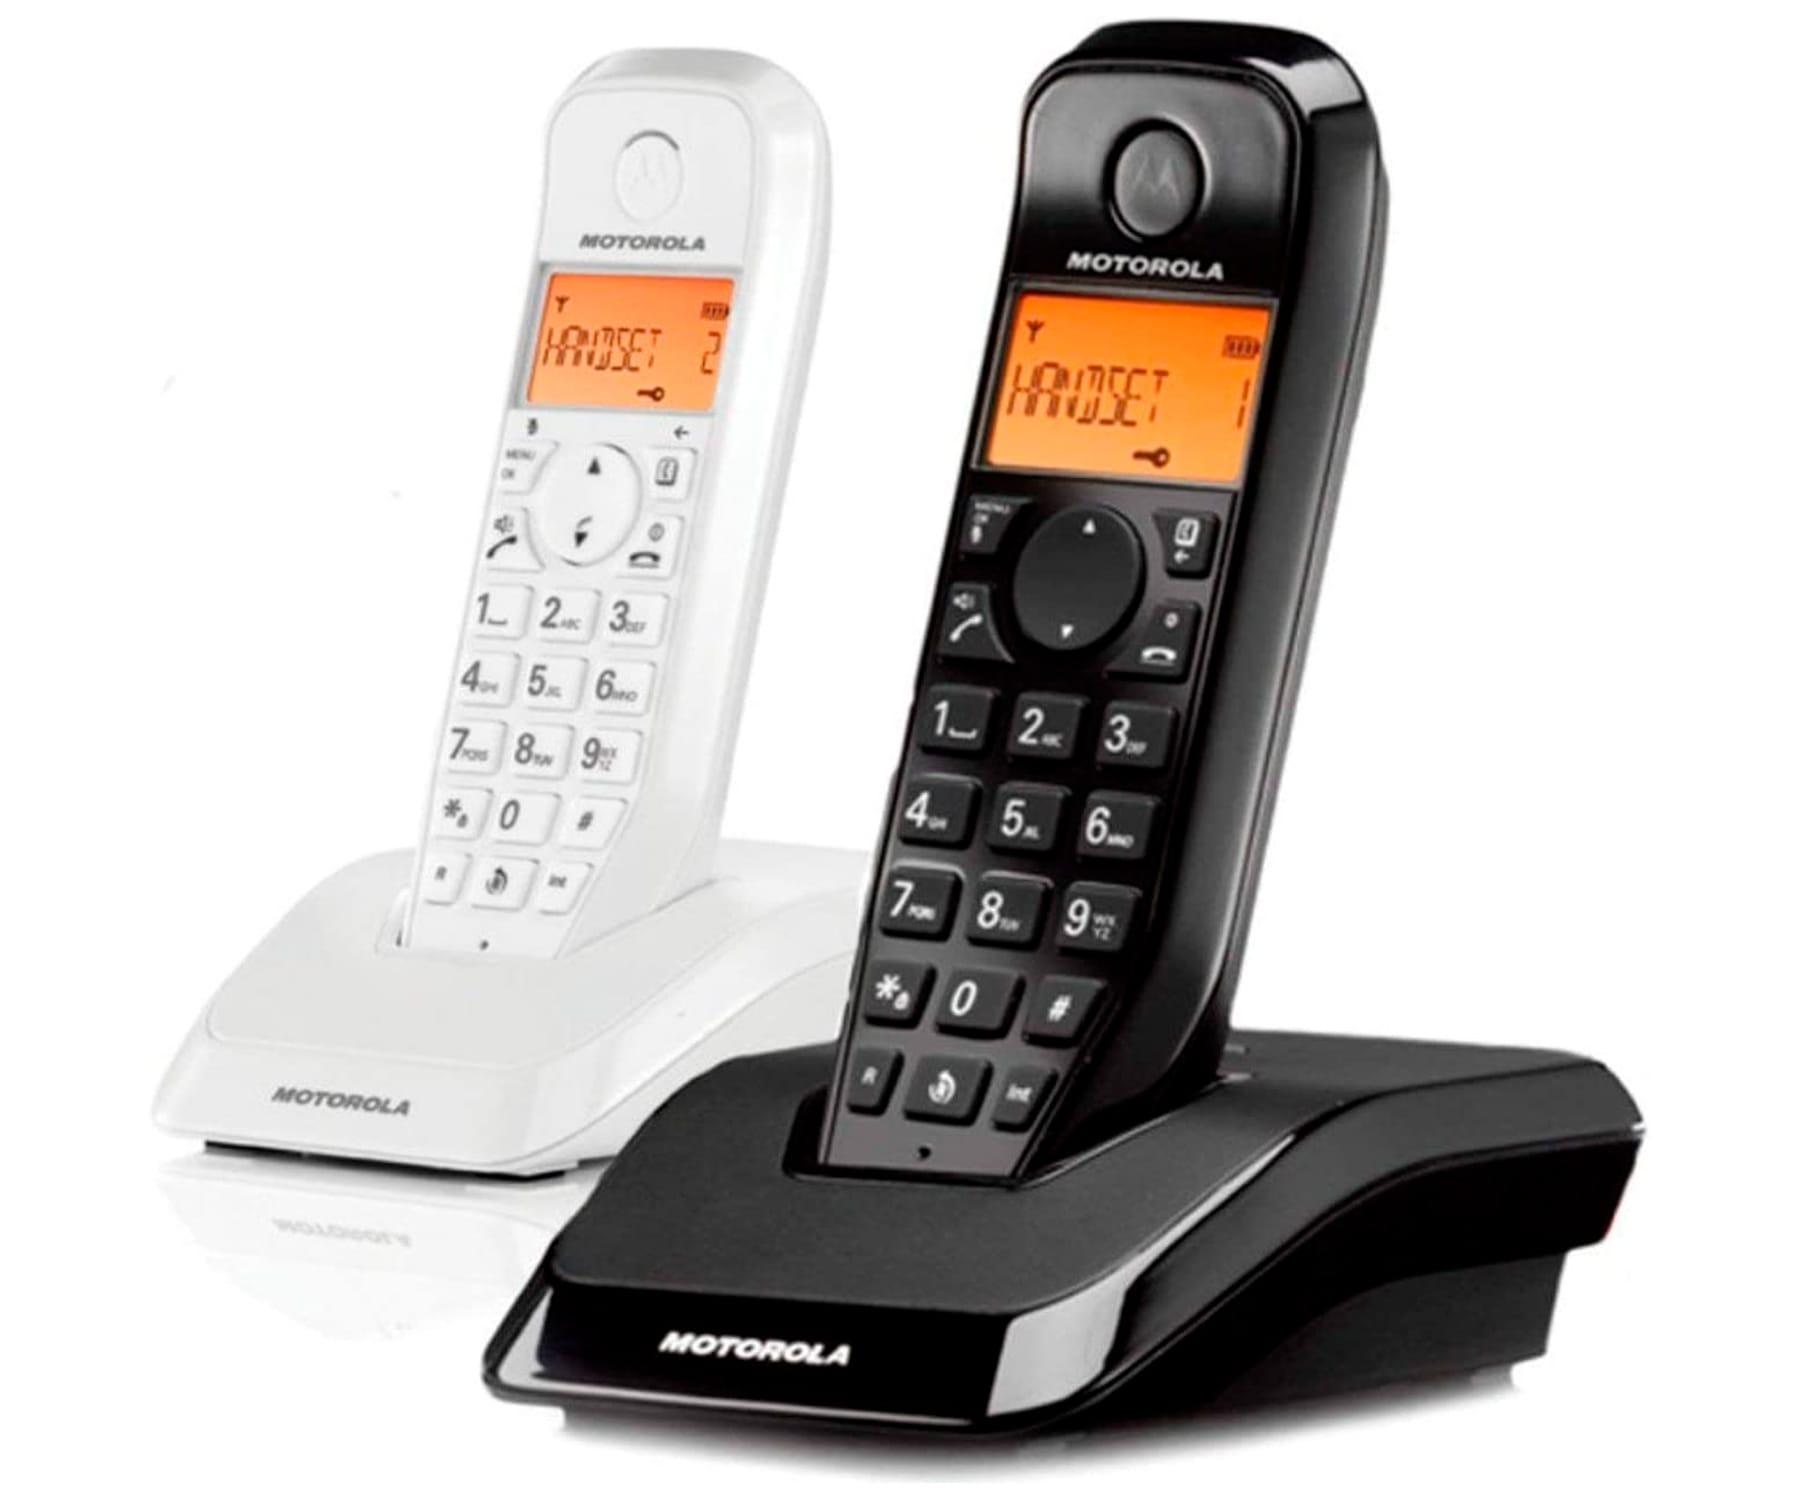 MOTOROLA S1202 BLANCO/NEGRO DUO TELÉFONO INALÁMBRICO MANOS LIBRES 50 CONTACTOS